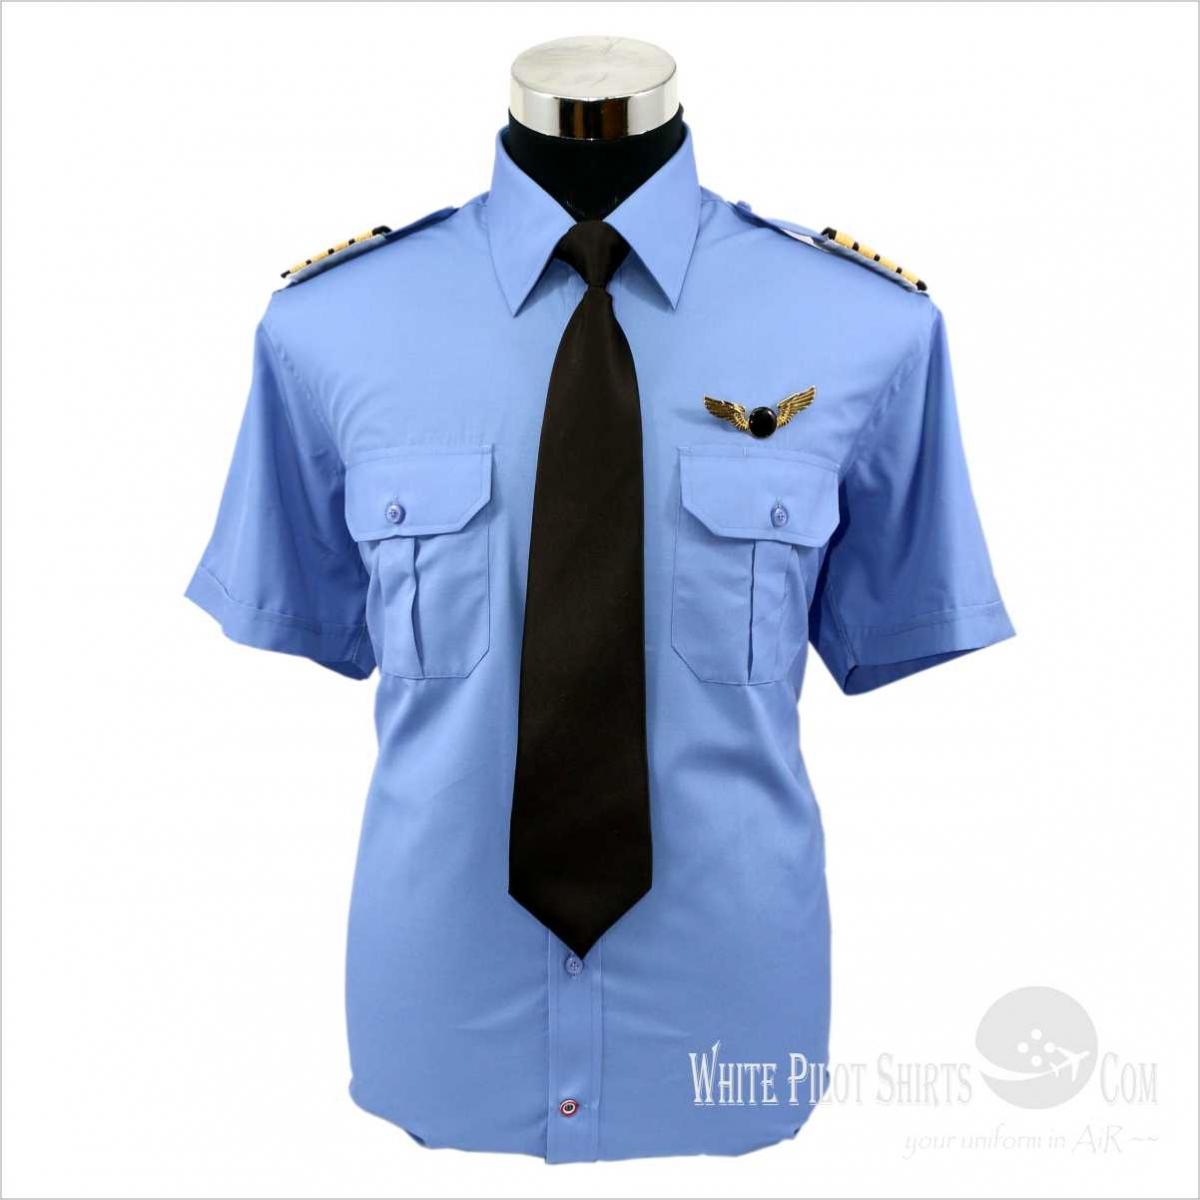 Blue Pilot Shirts 50 Cotton 50 Polyester Pilot